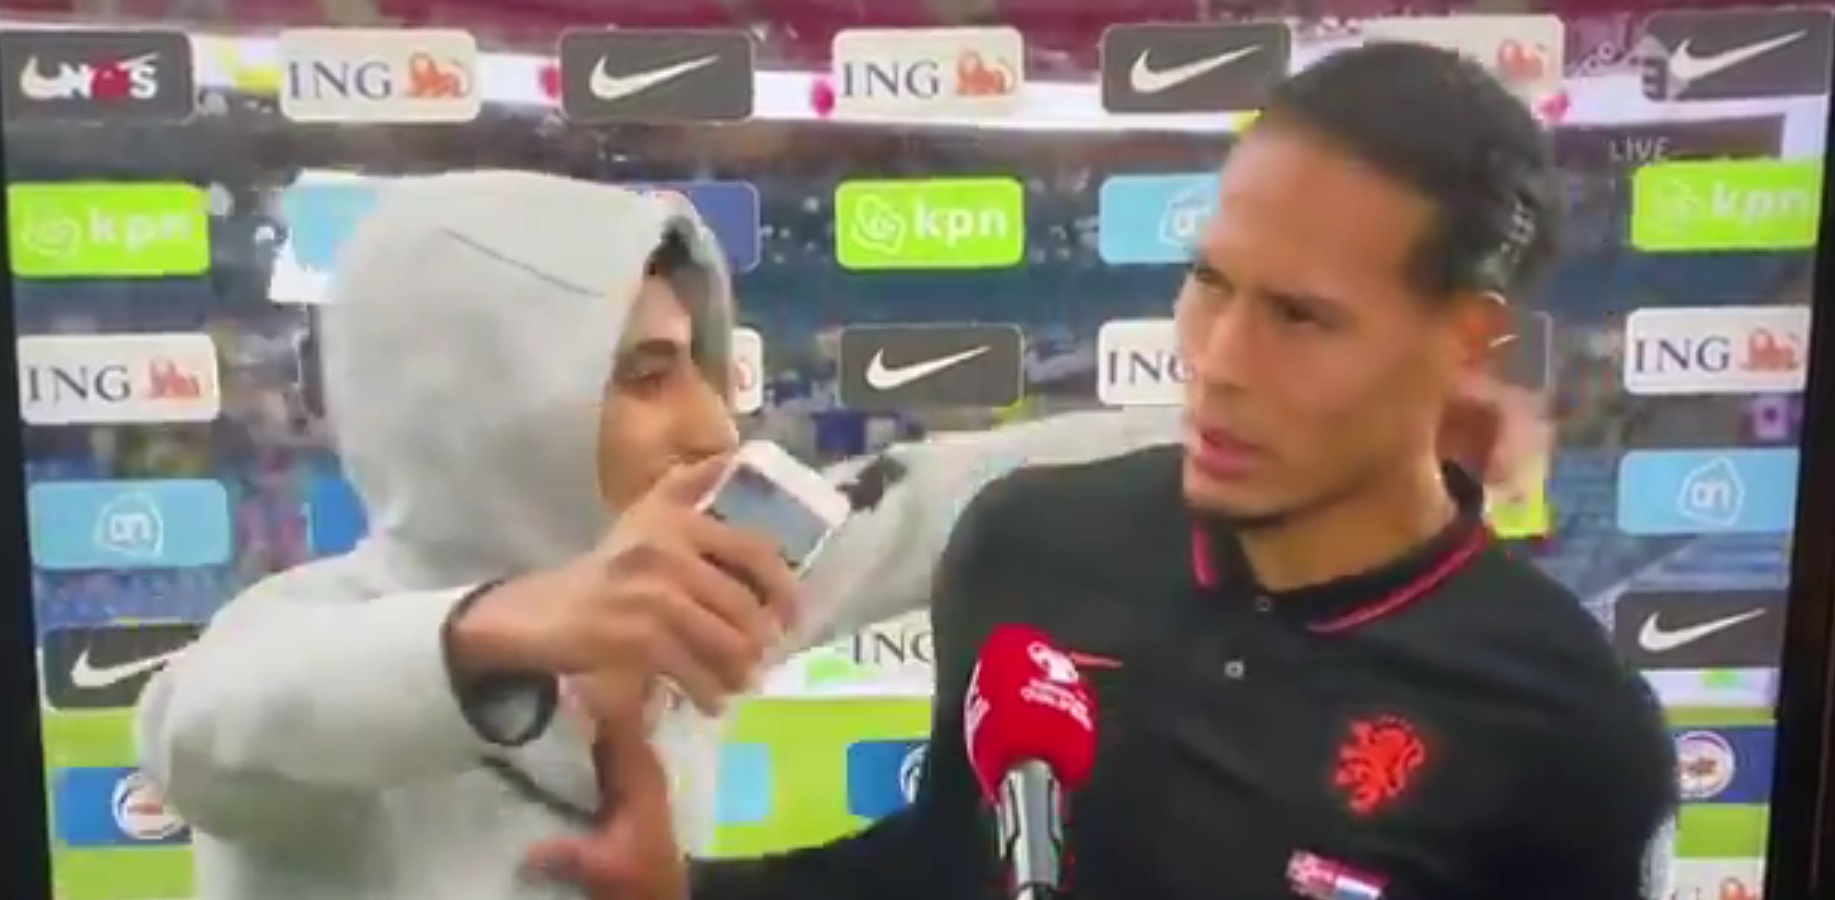 (Video) Liverpool star Virgil van Dijk pushes away excited fan in funny clip